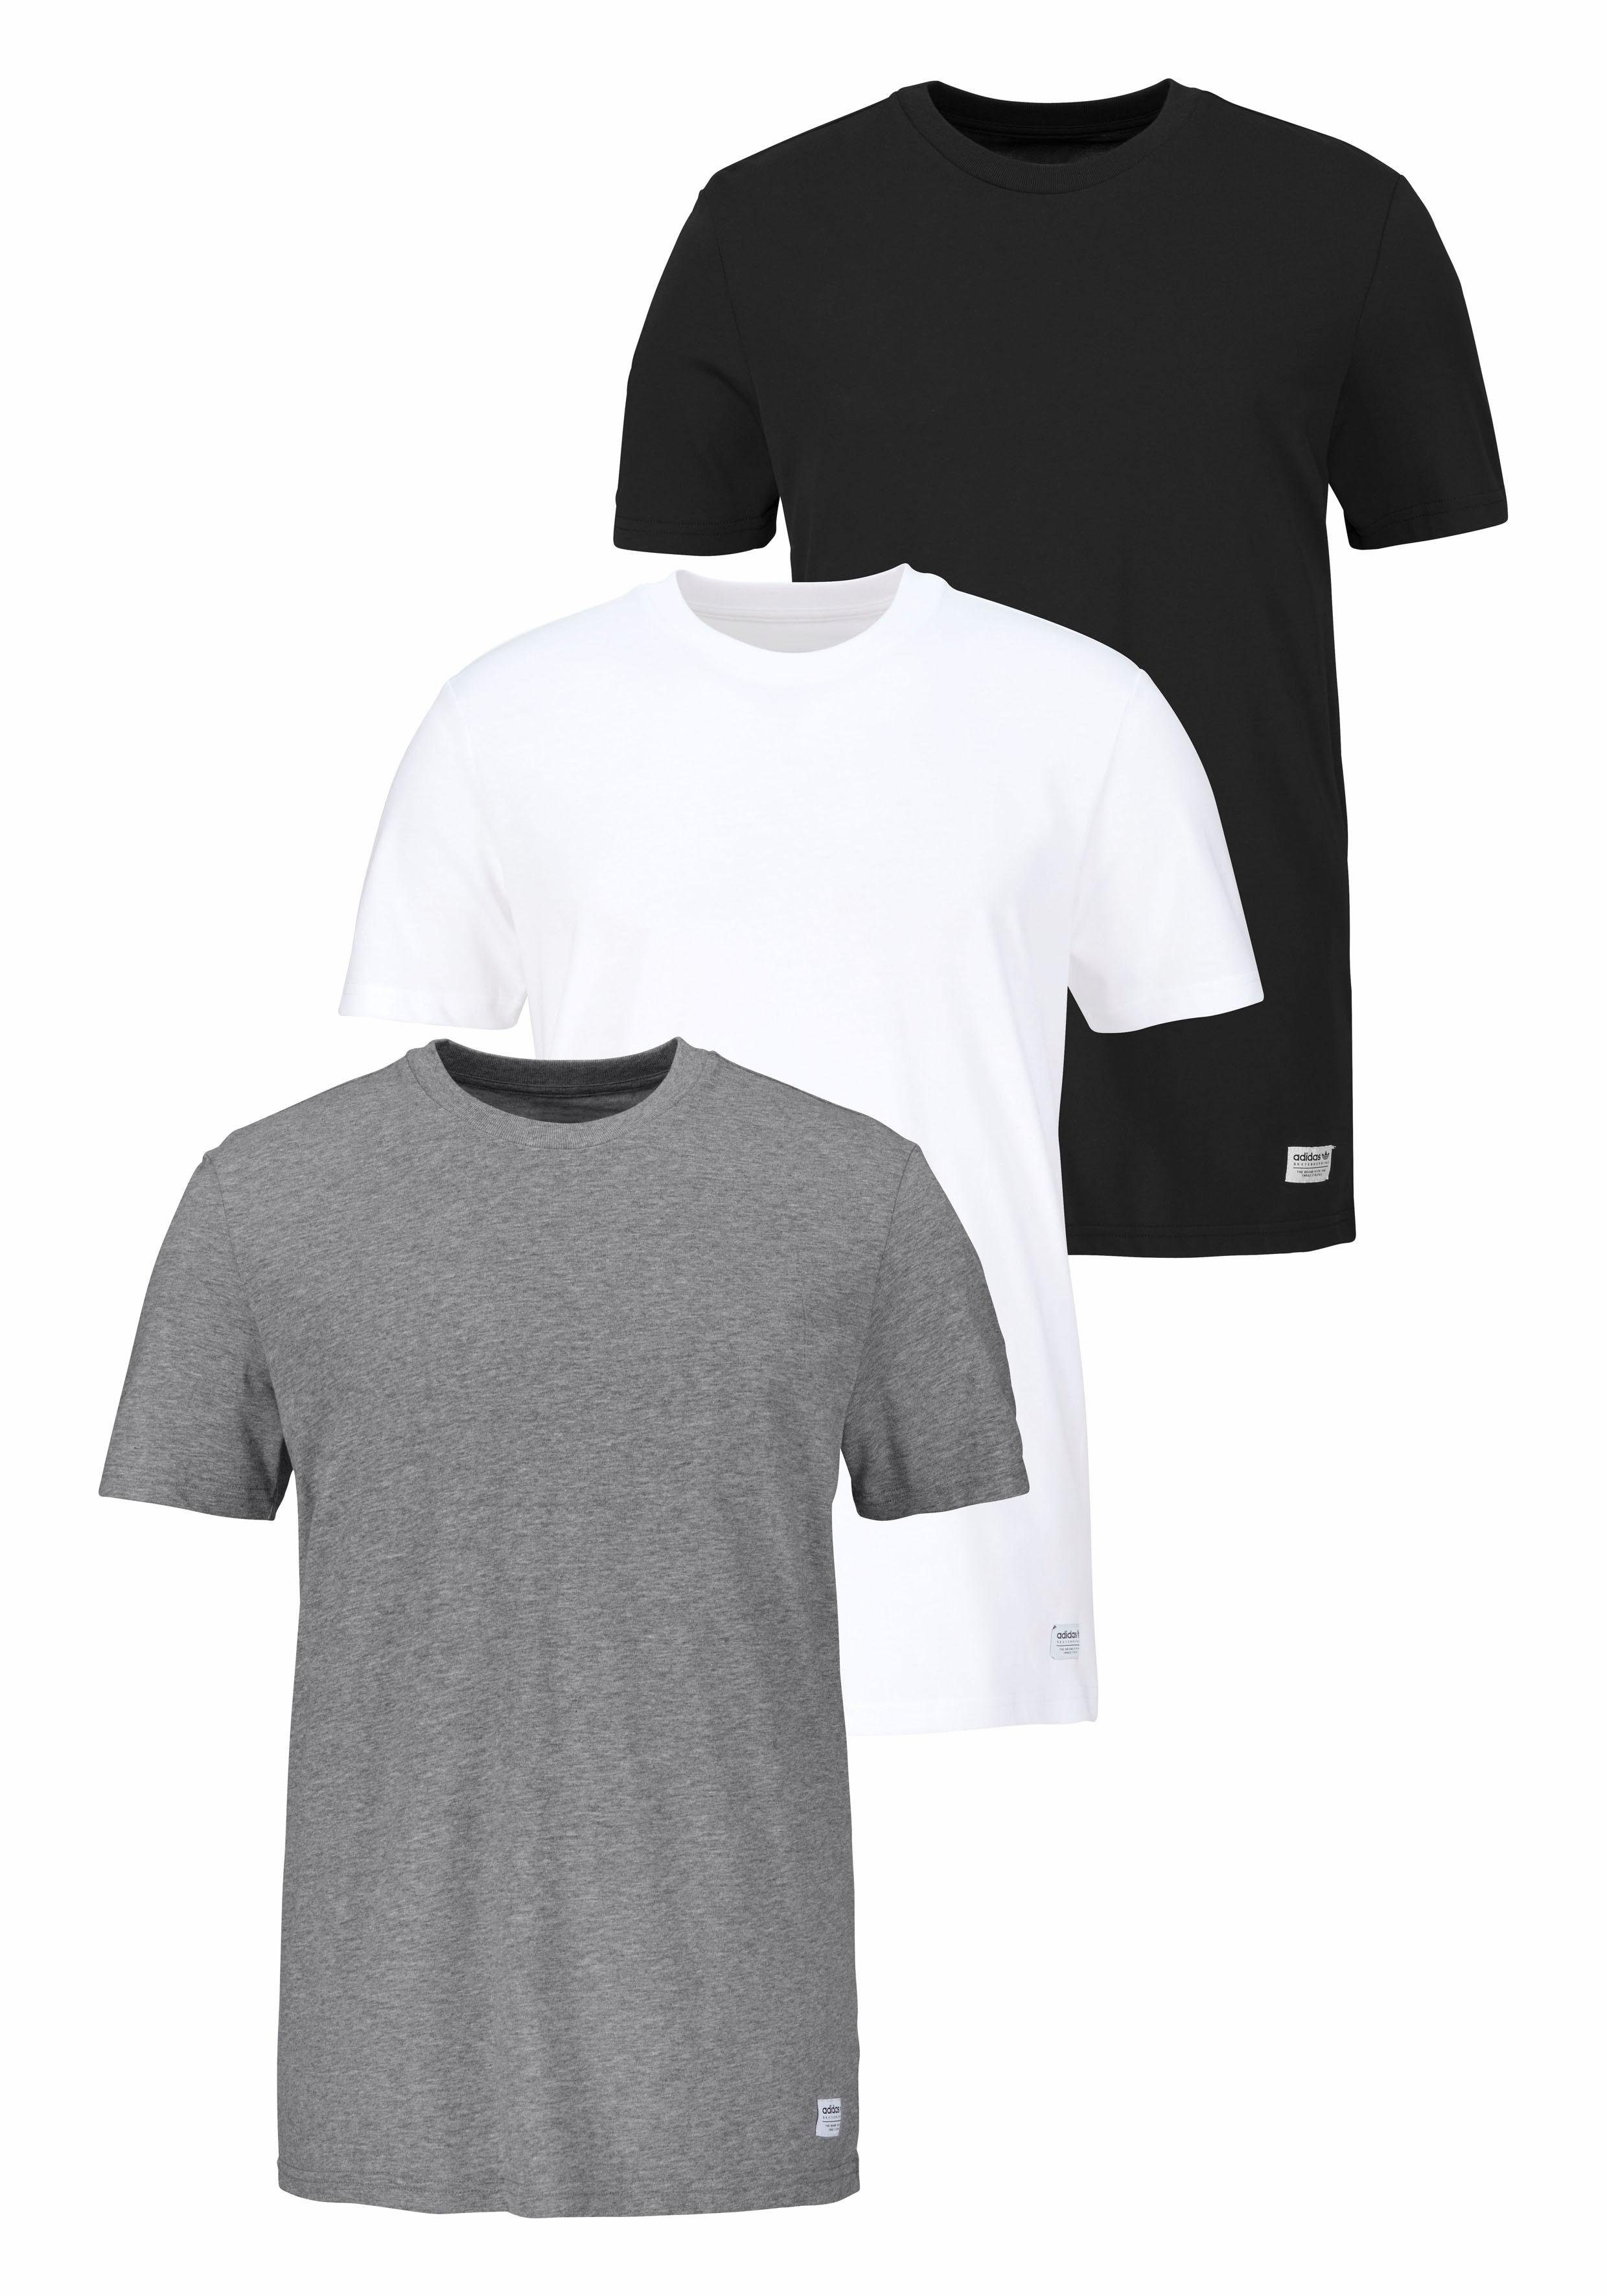 XL 56//58 weiß  NEU Herrenshirt T.-Shirt Tank Top Sportshirt Baumwolle  Gr